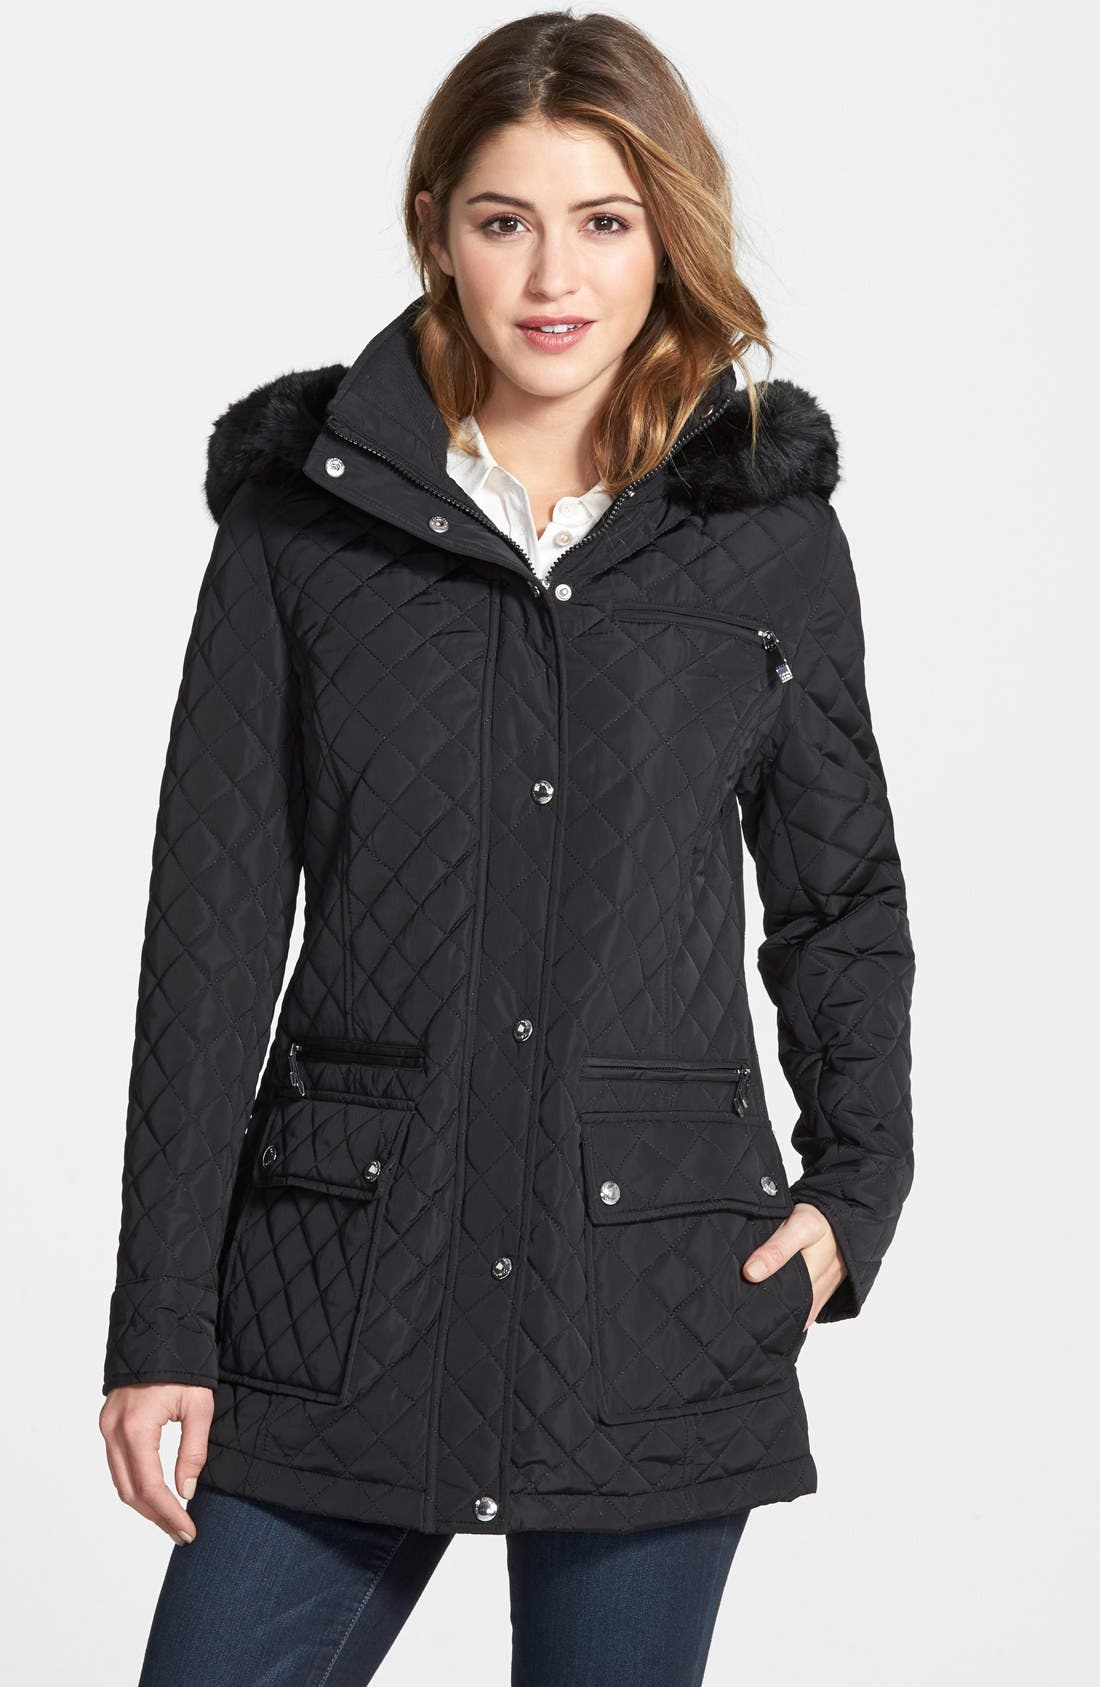 Quilted Coat with Detachable Faux Fur Trim Hood, Main, color, 001